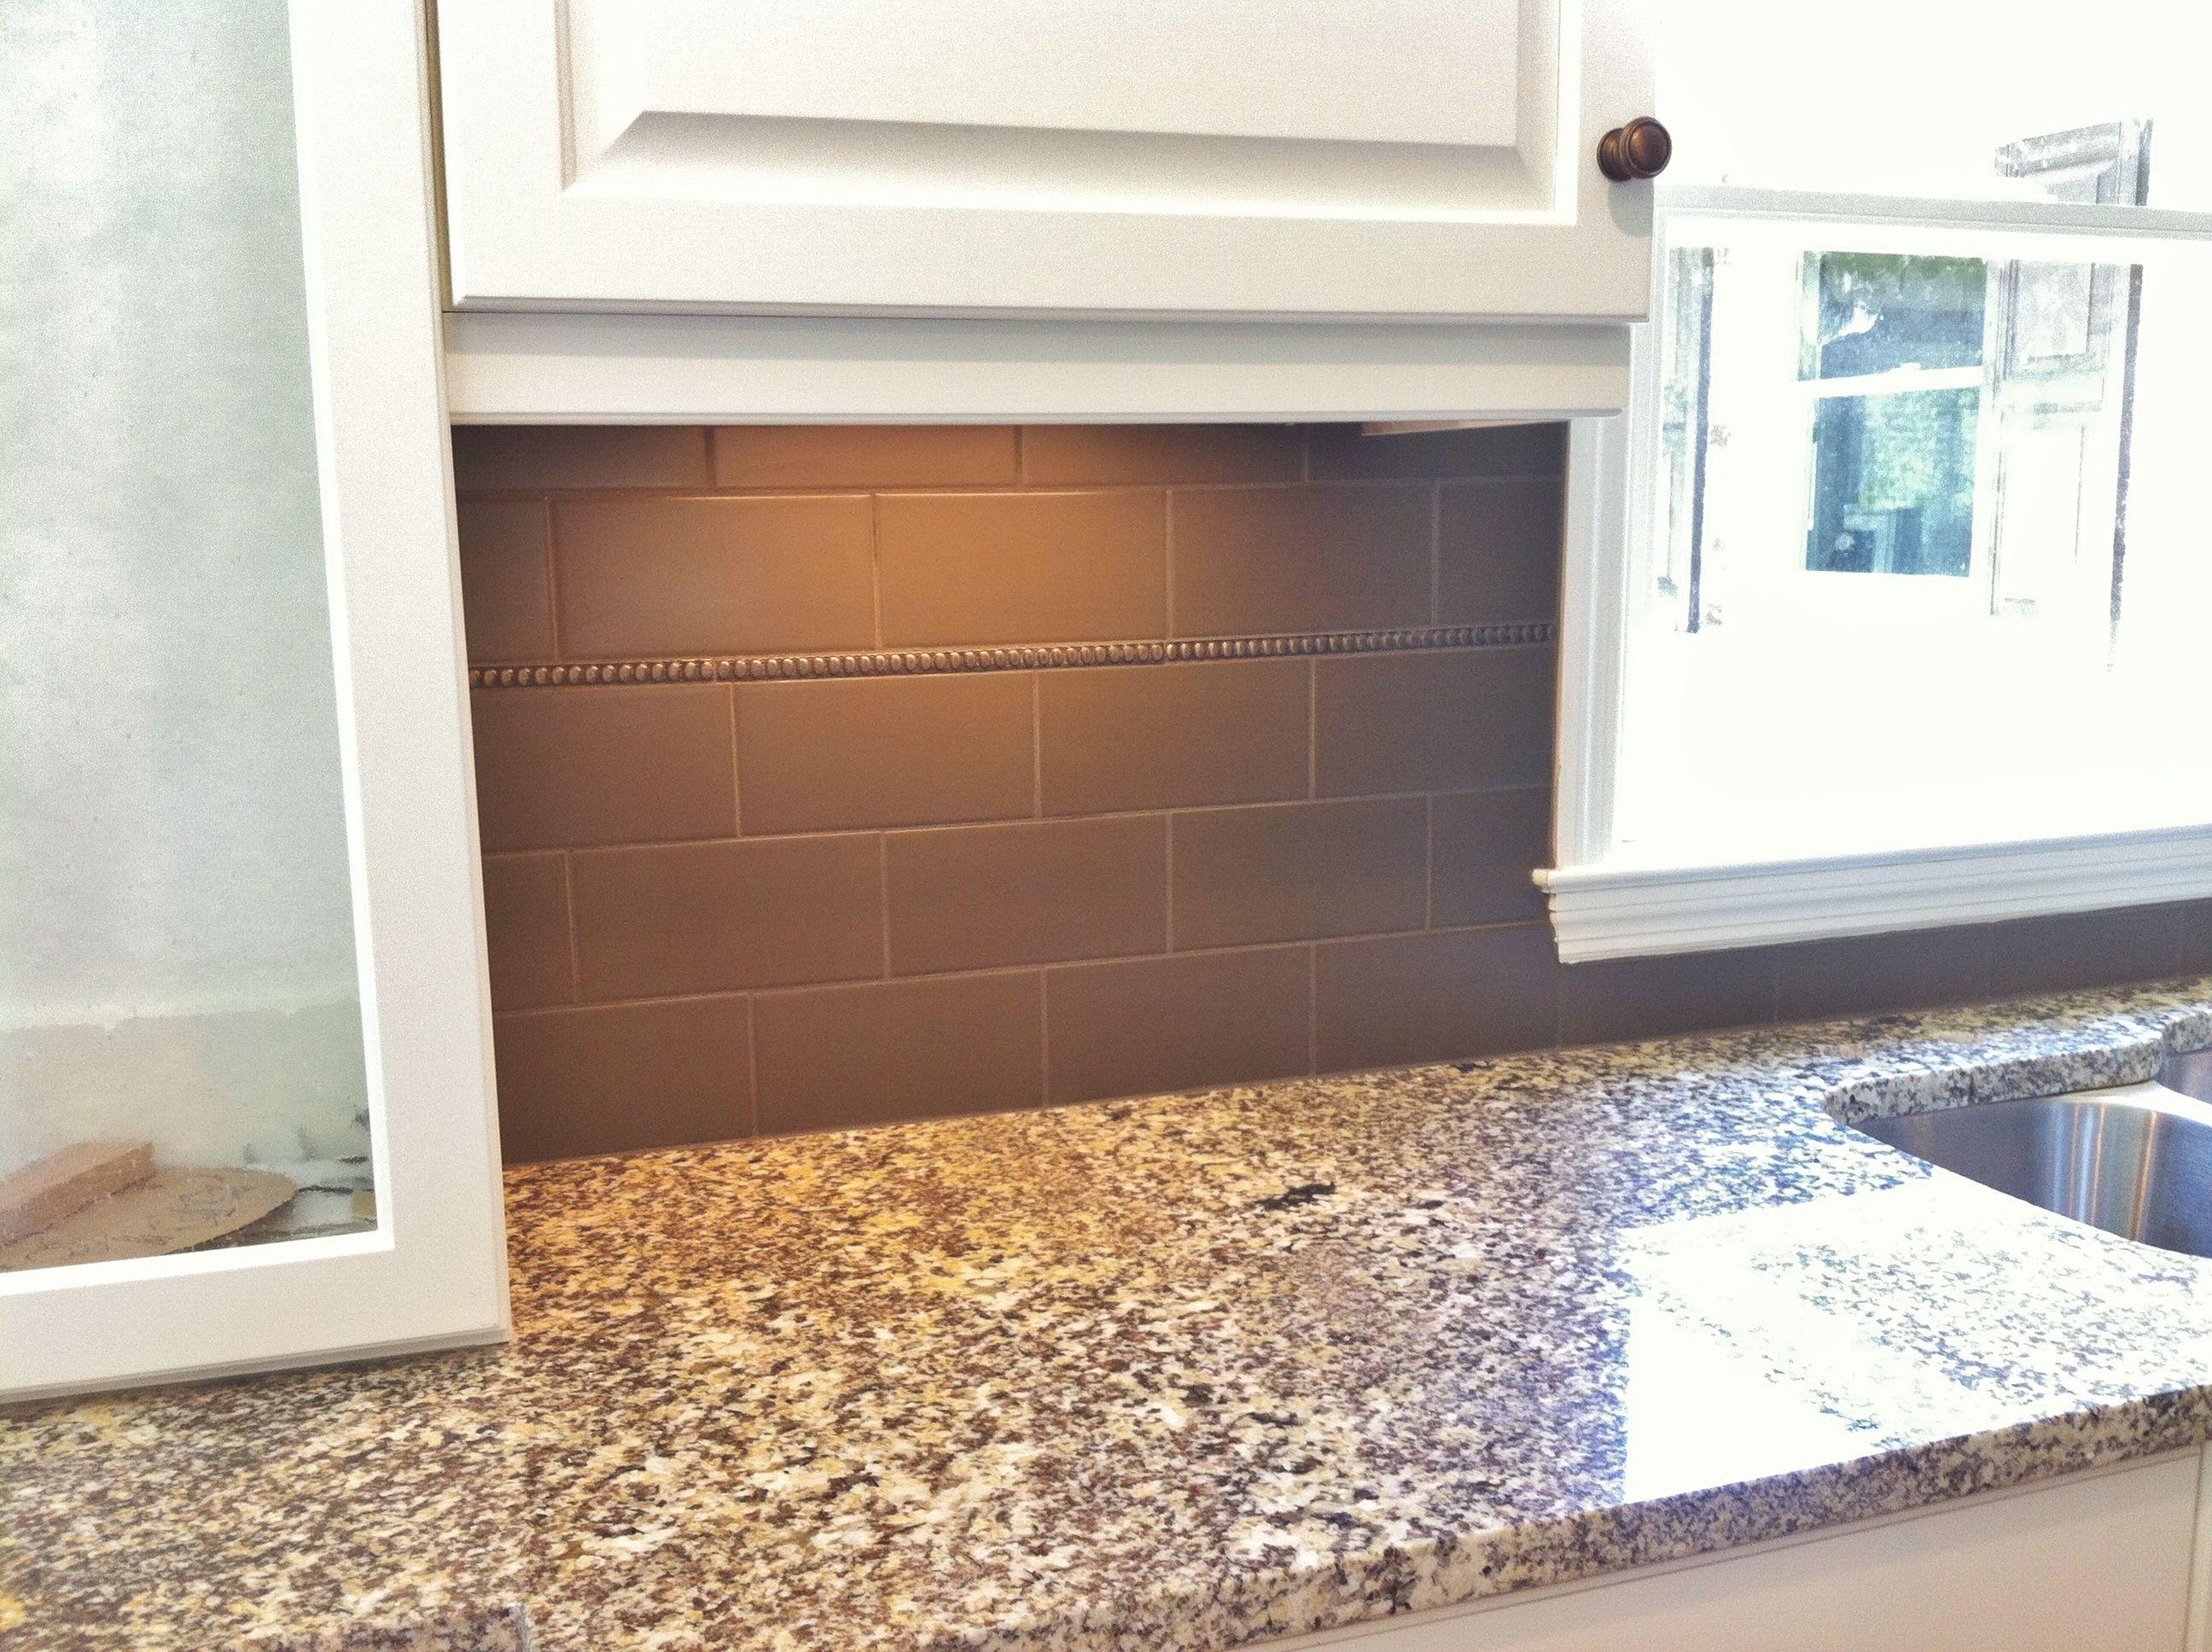 - 4x8 Porcelain Tile With Bronze Accent At Kitchen Backsplash